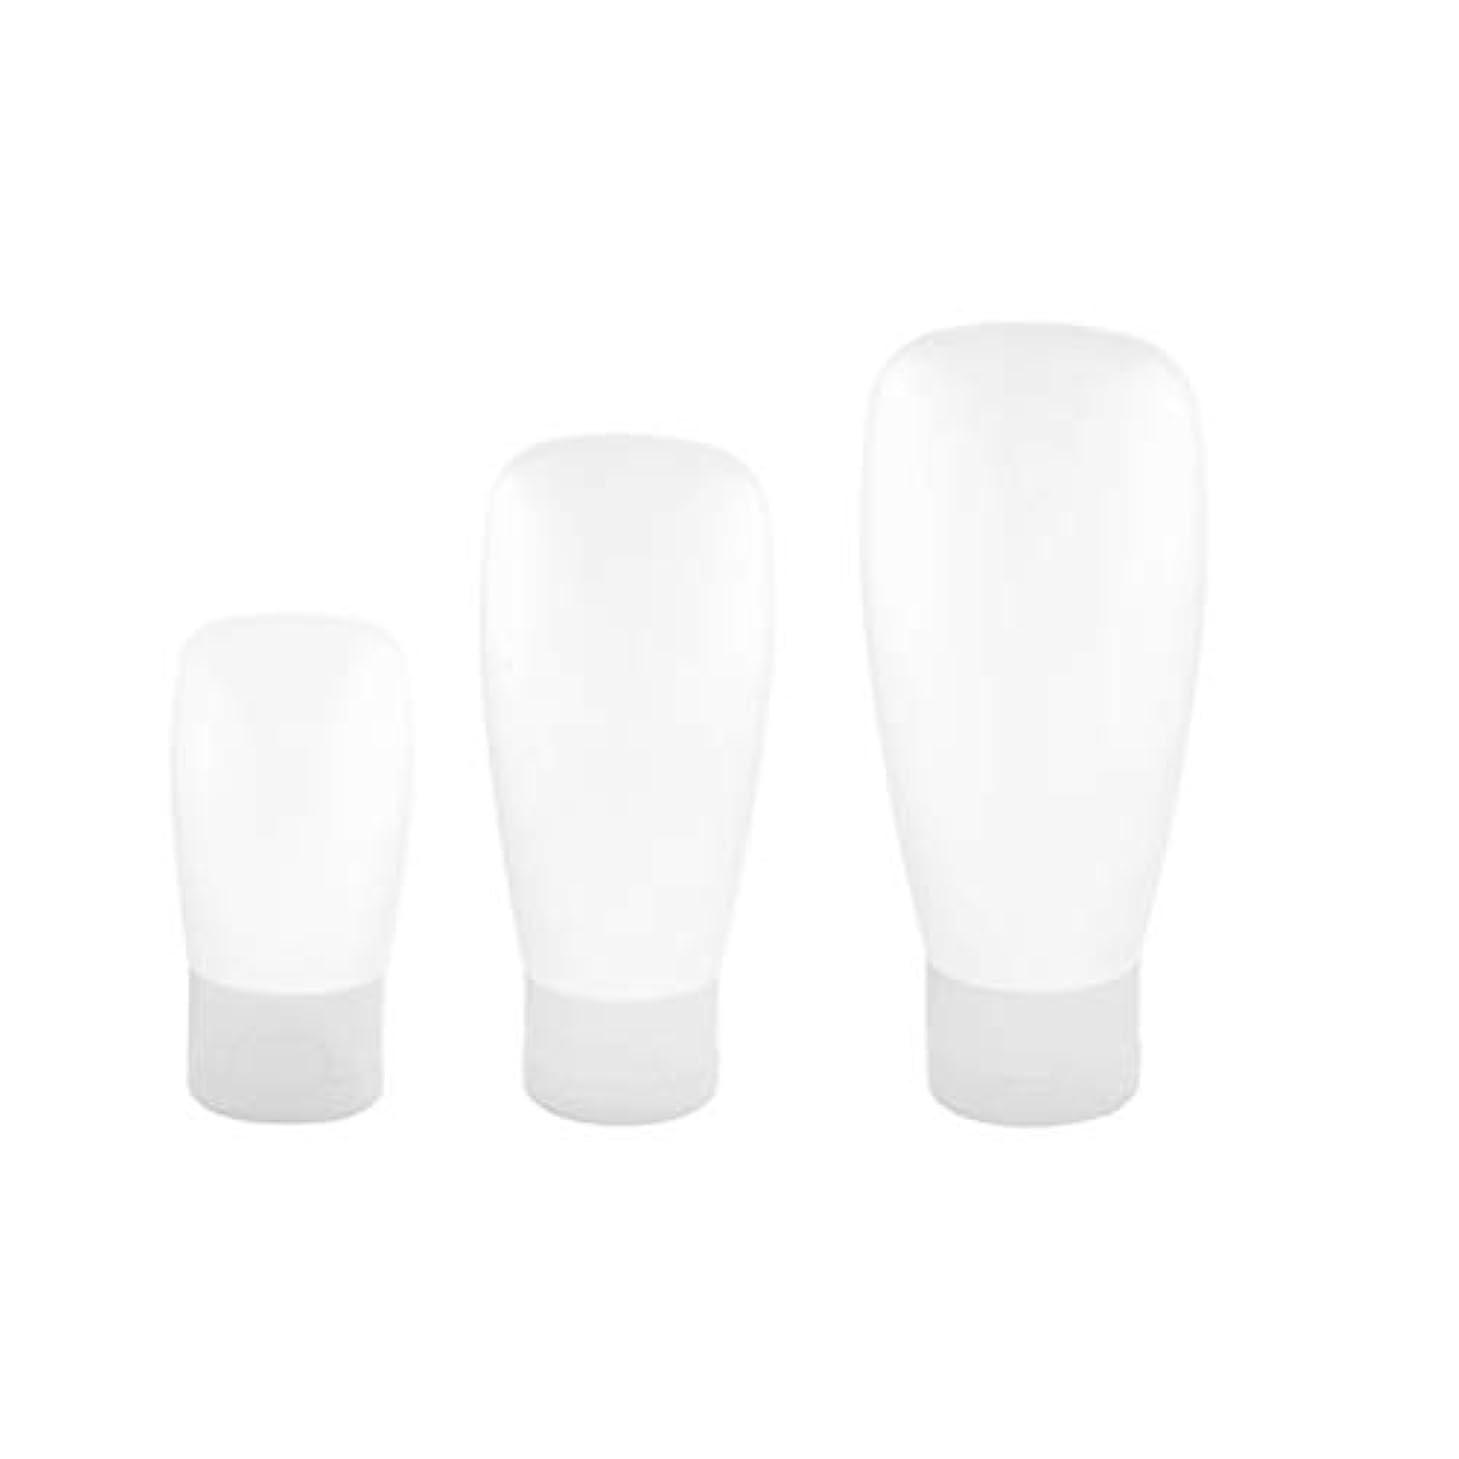 TOPBATHY 3本旅行ボトルプラスチック詰め替え式トラベルコンテナスクイーズトラベルチューブセット用シャンプーローションソープ30ML 60ML 100ML(ホワイト)